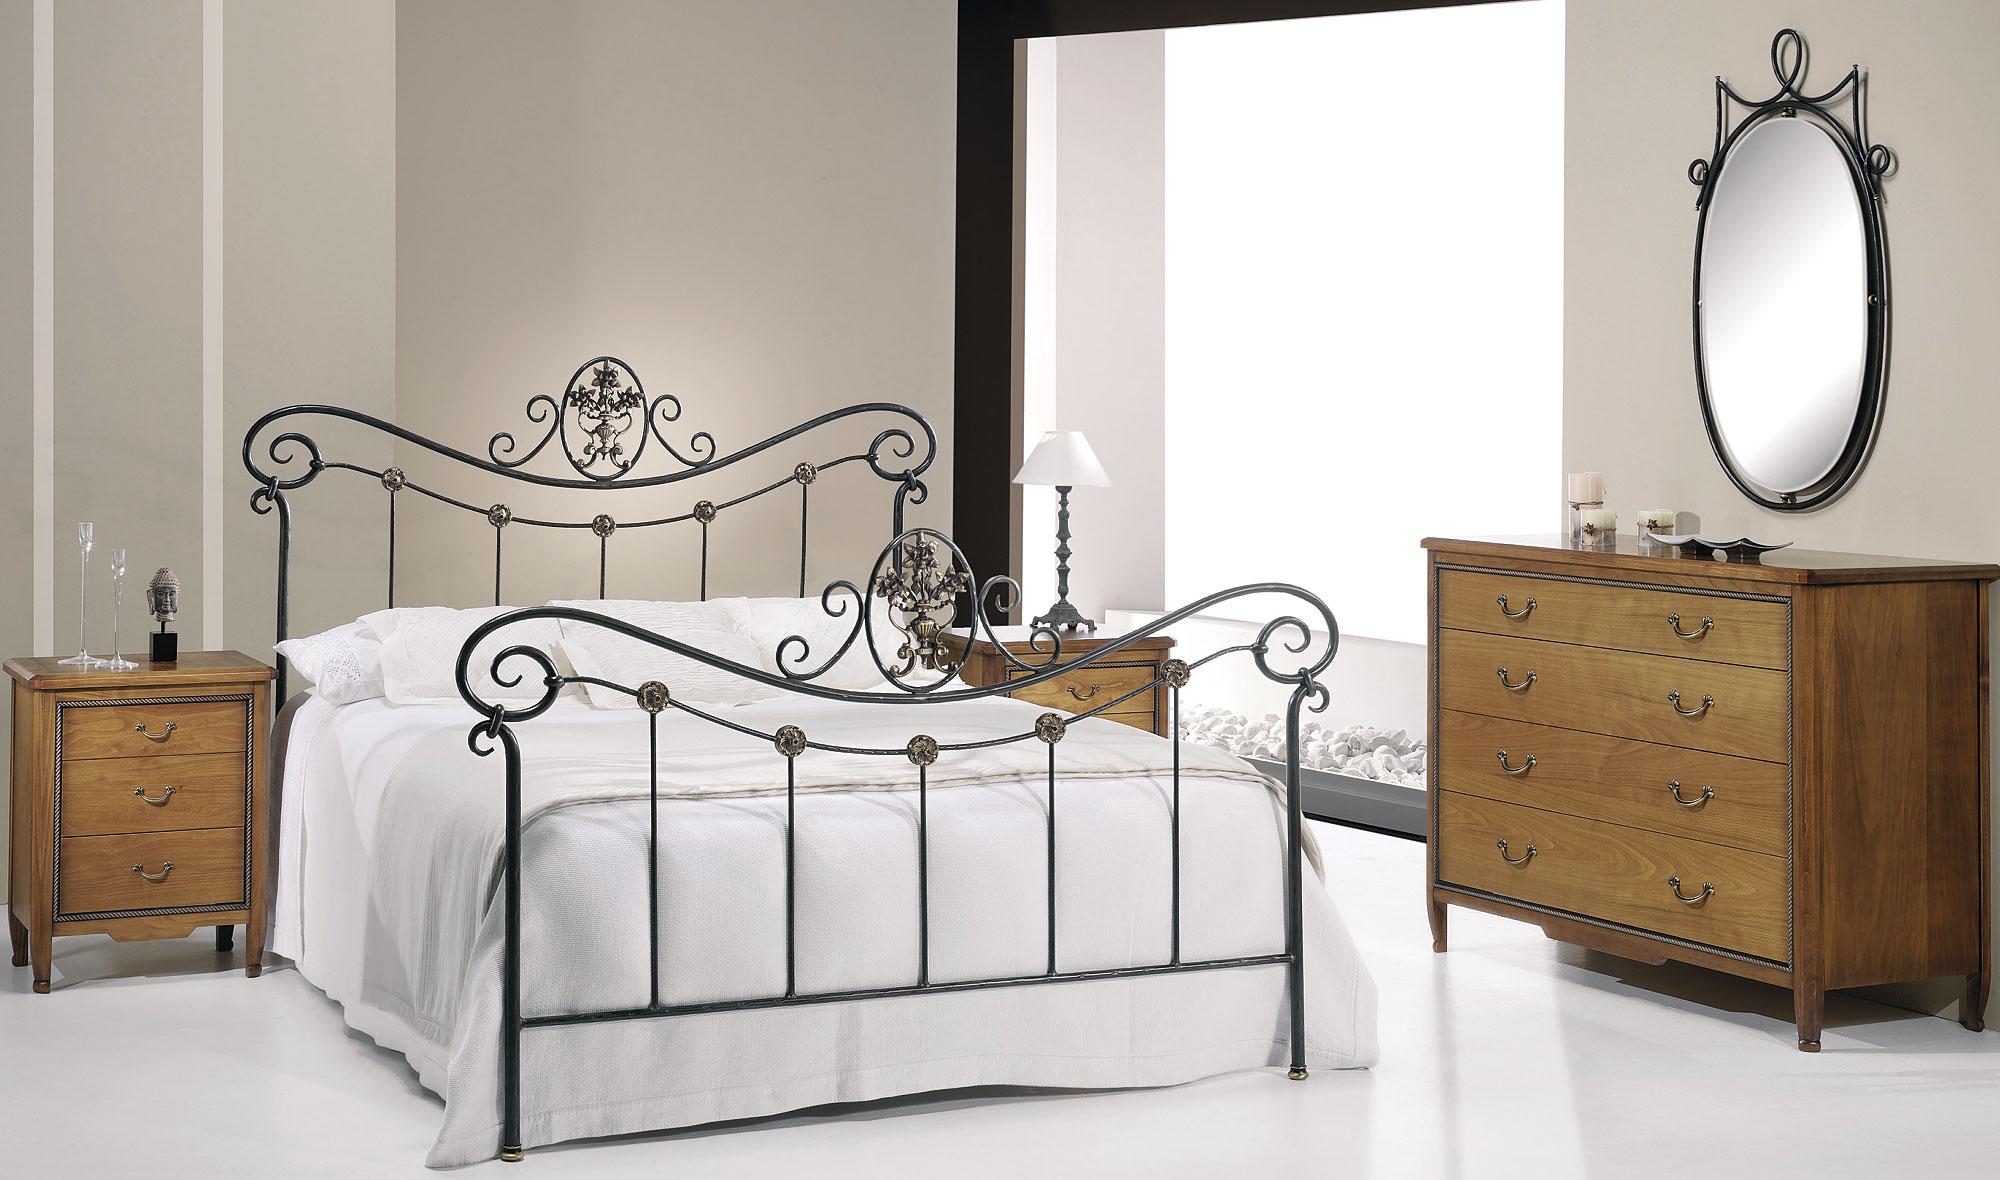 Dormitorio forja laura en - Muebles en forja ...